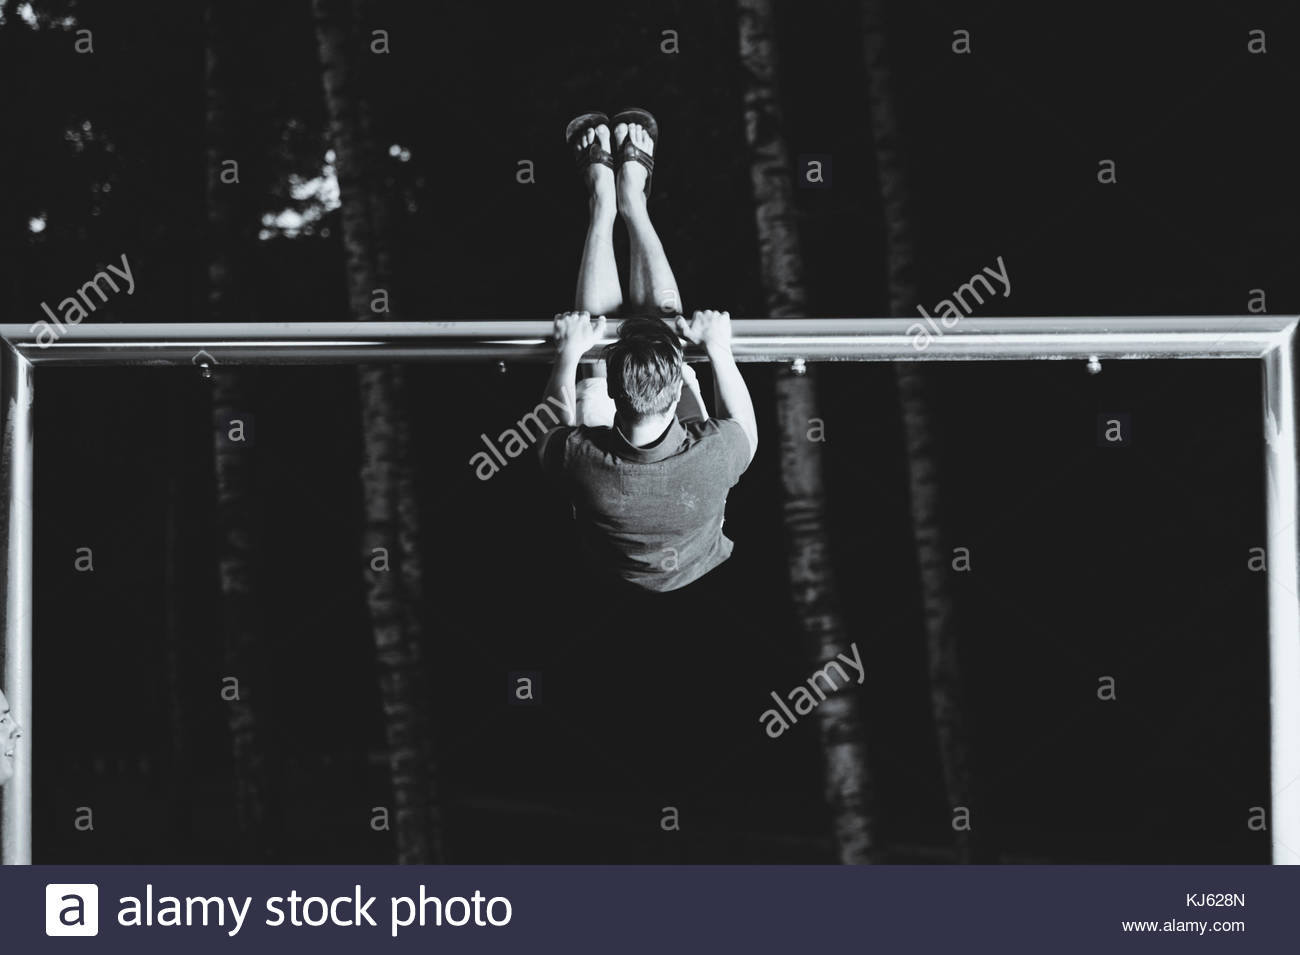 El hombre ejerce sobre las barras paralelas Imagen De Stock